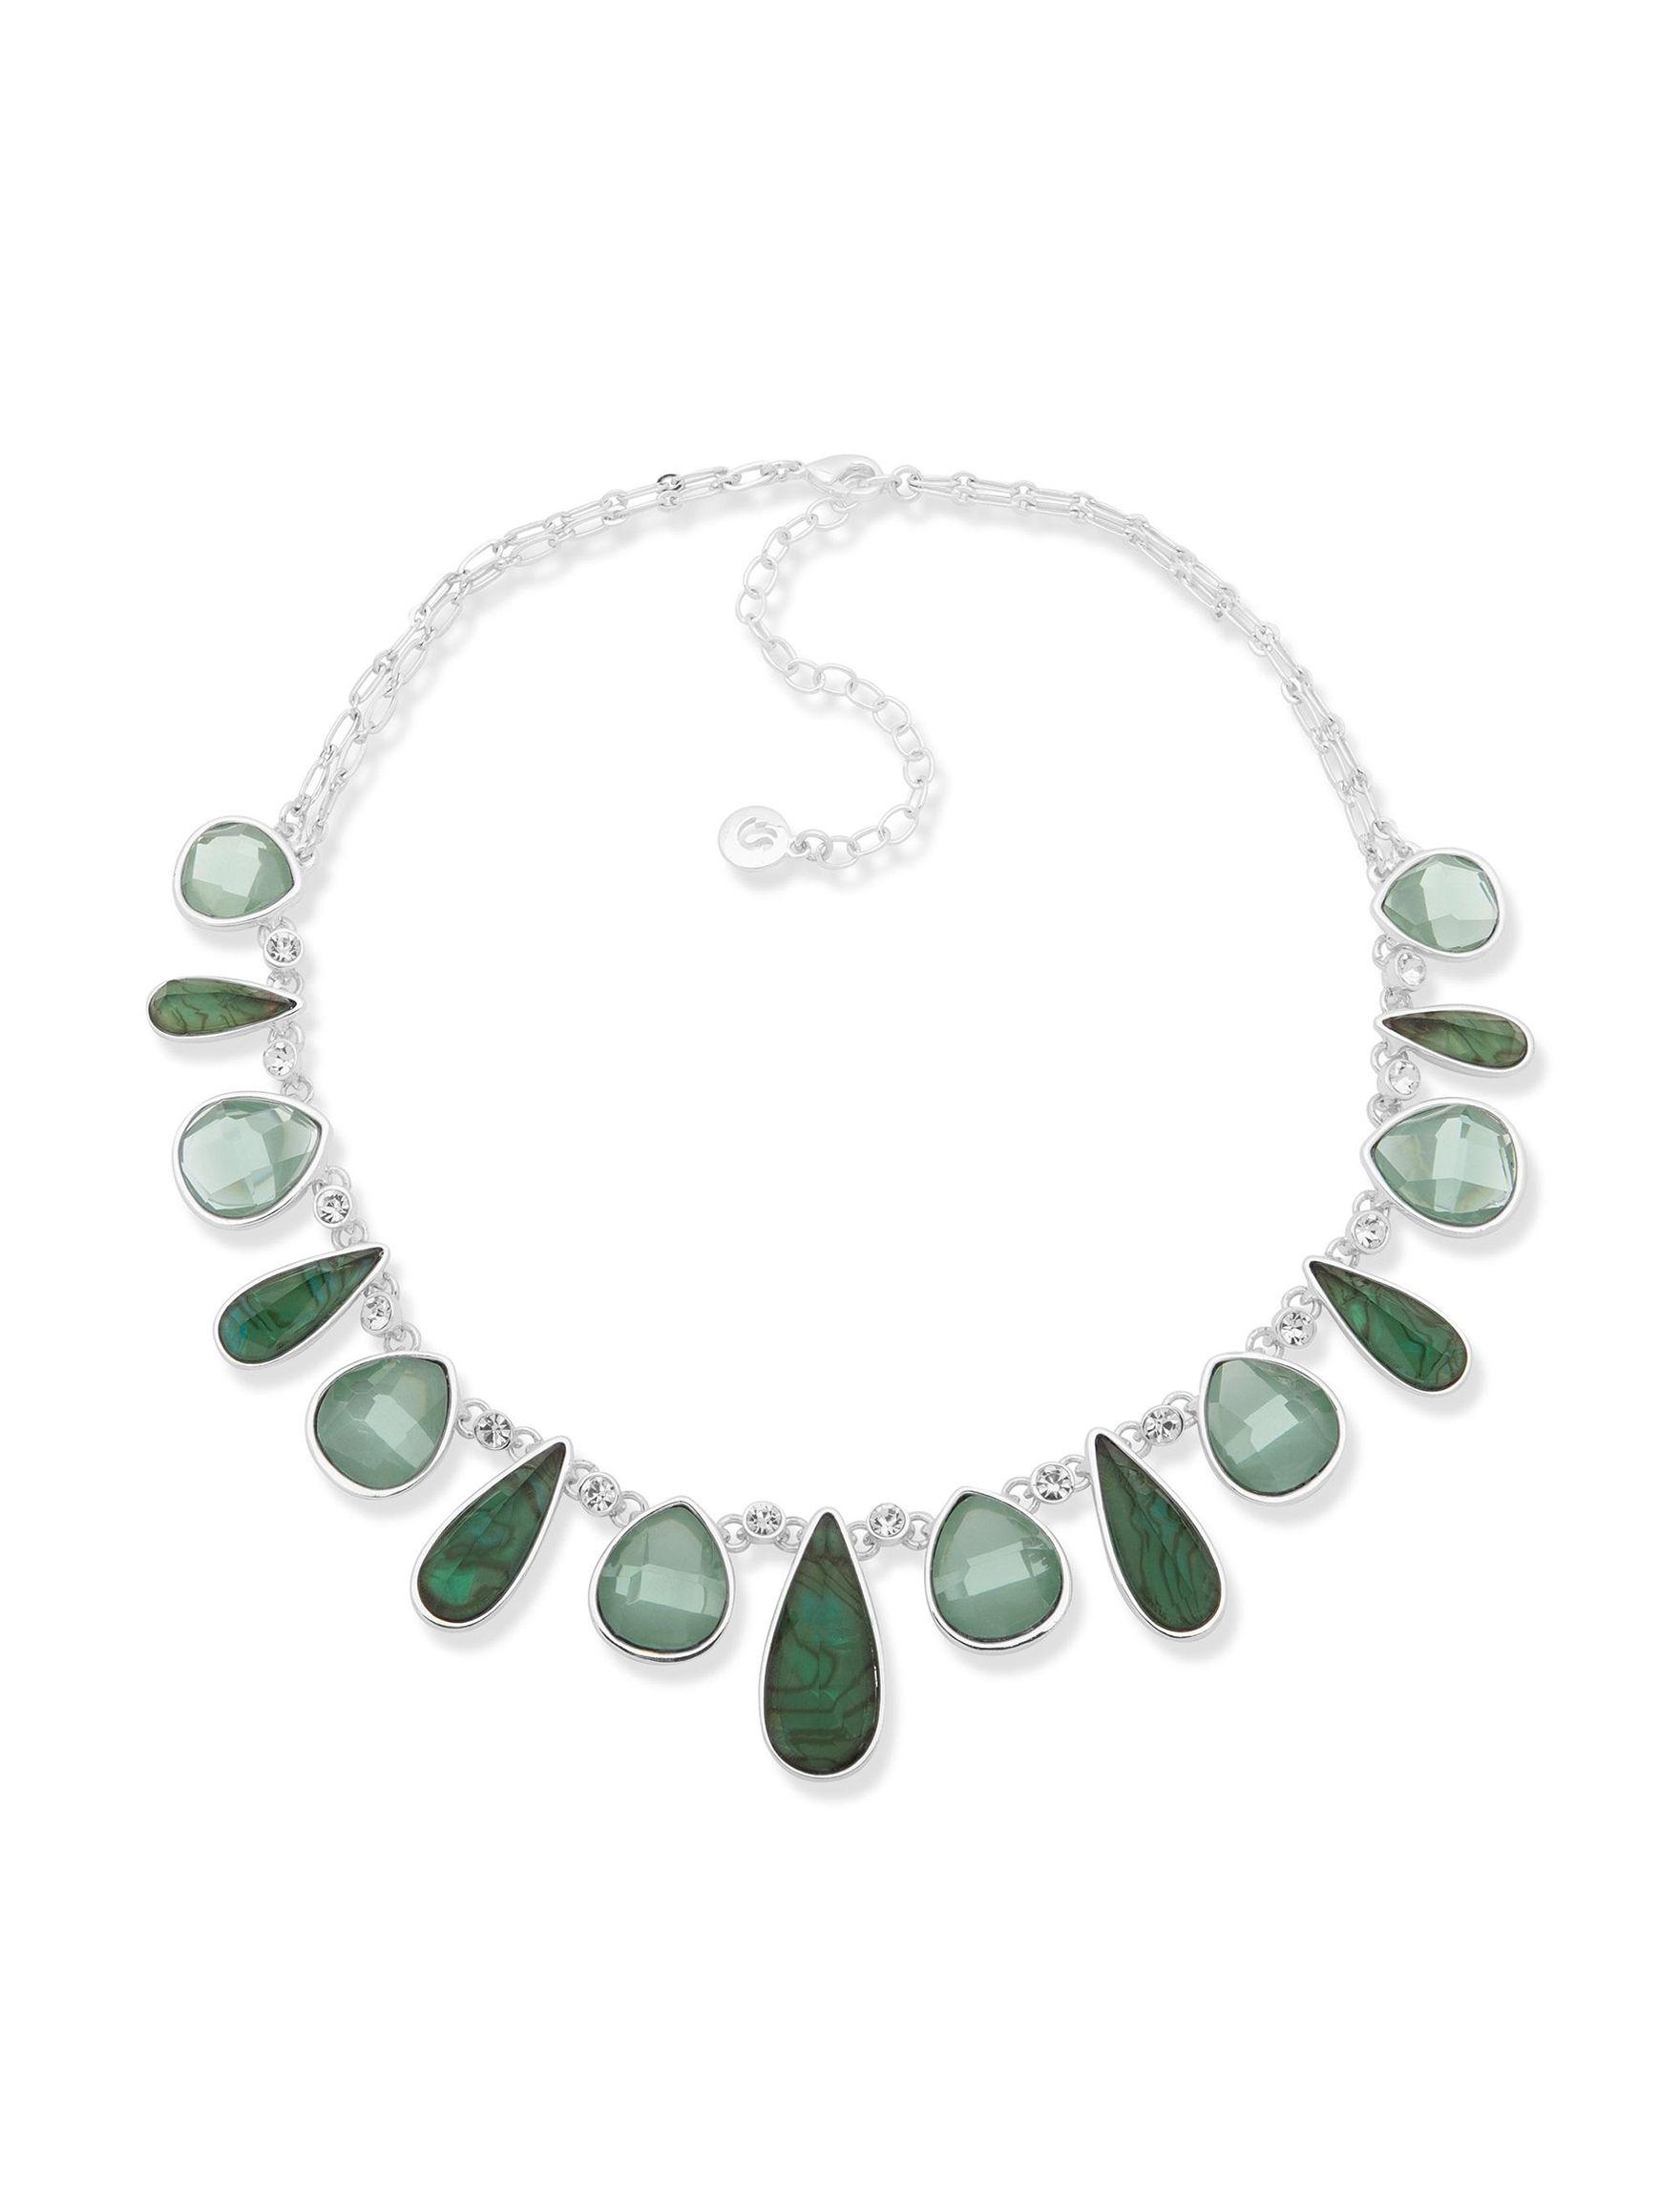 Gloria Vanderbilt Silver / Abalone Necklaces & Pendants Fashion Jewelry